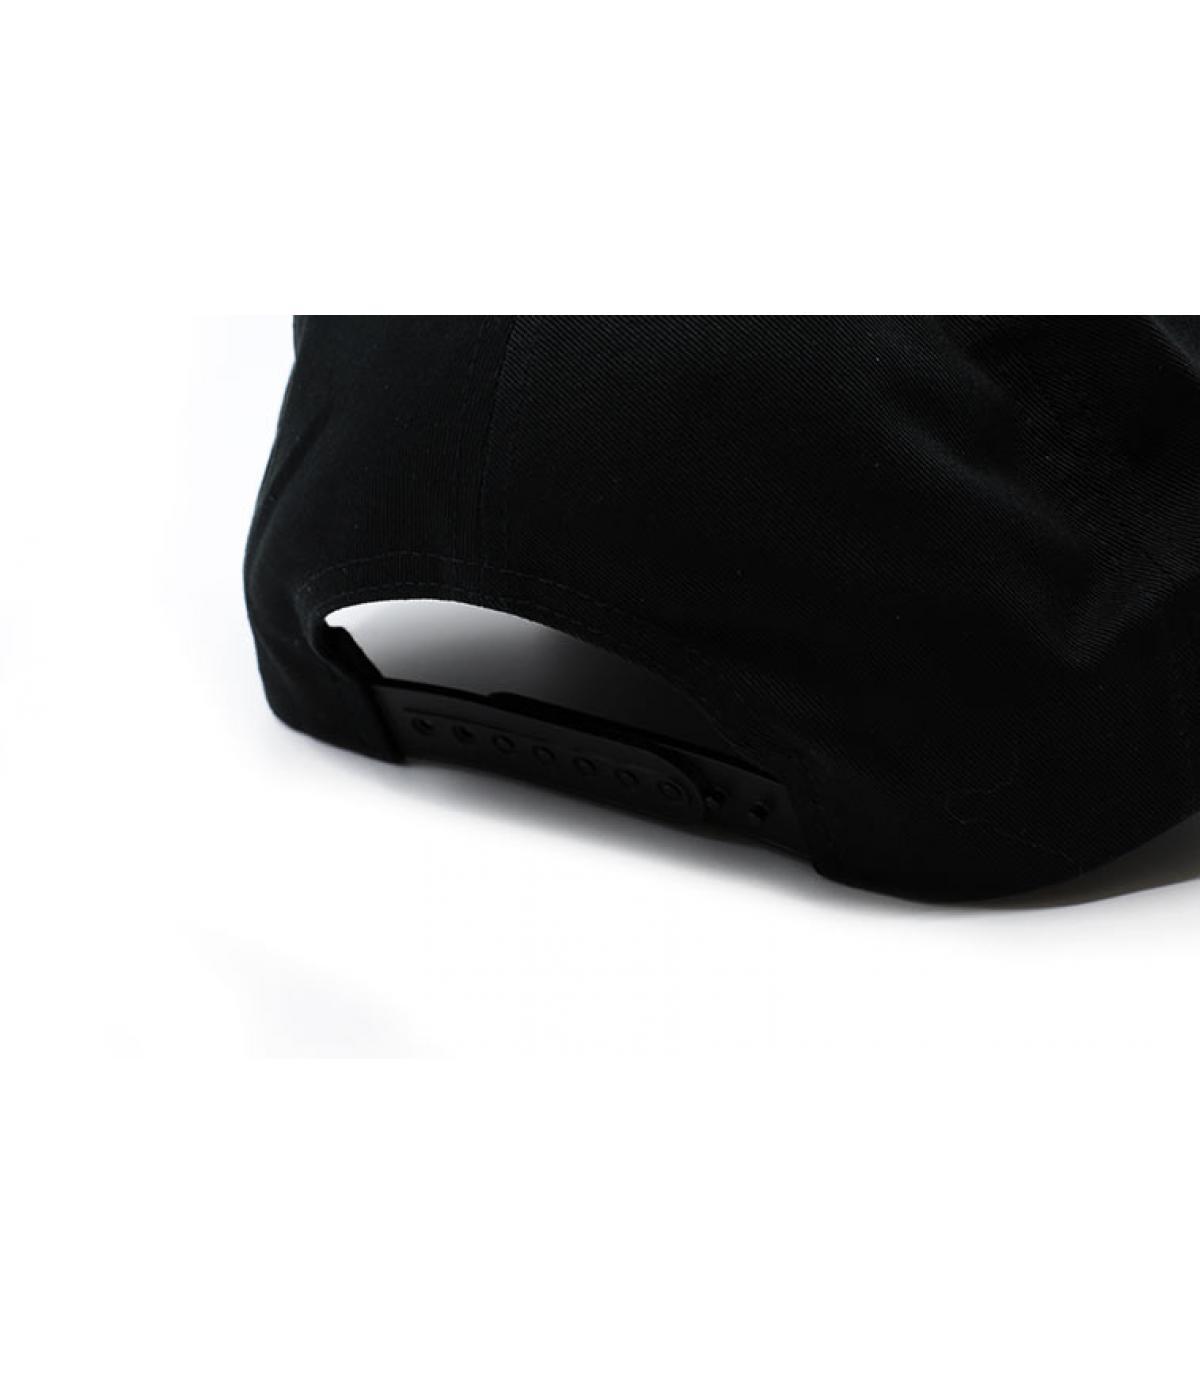 Details Motorklub black - afbeeling 5